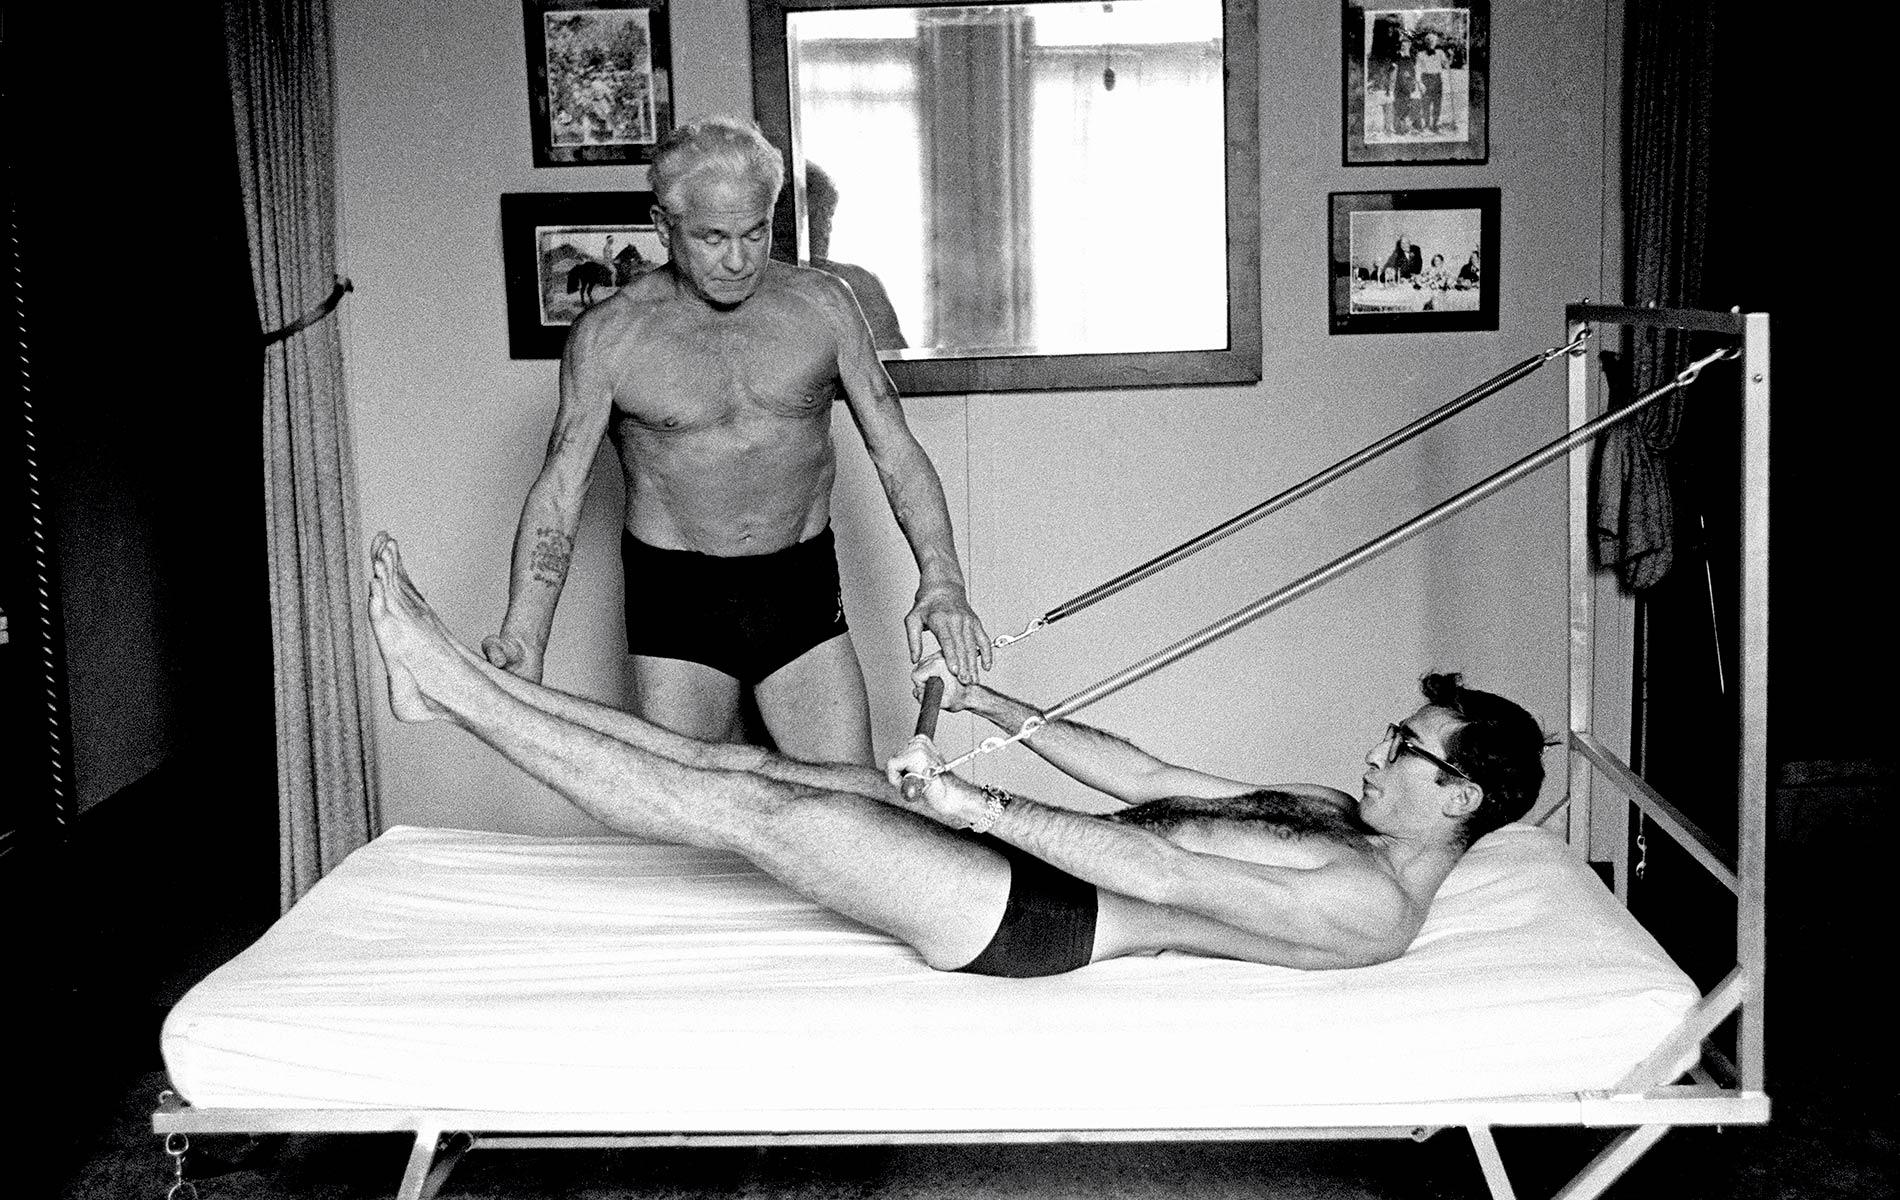 Joe Pilates